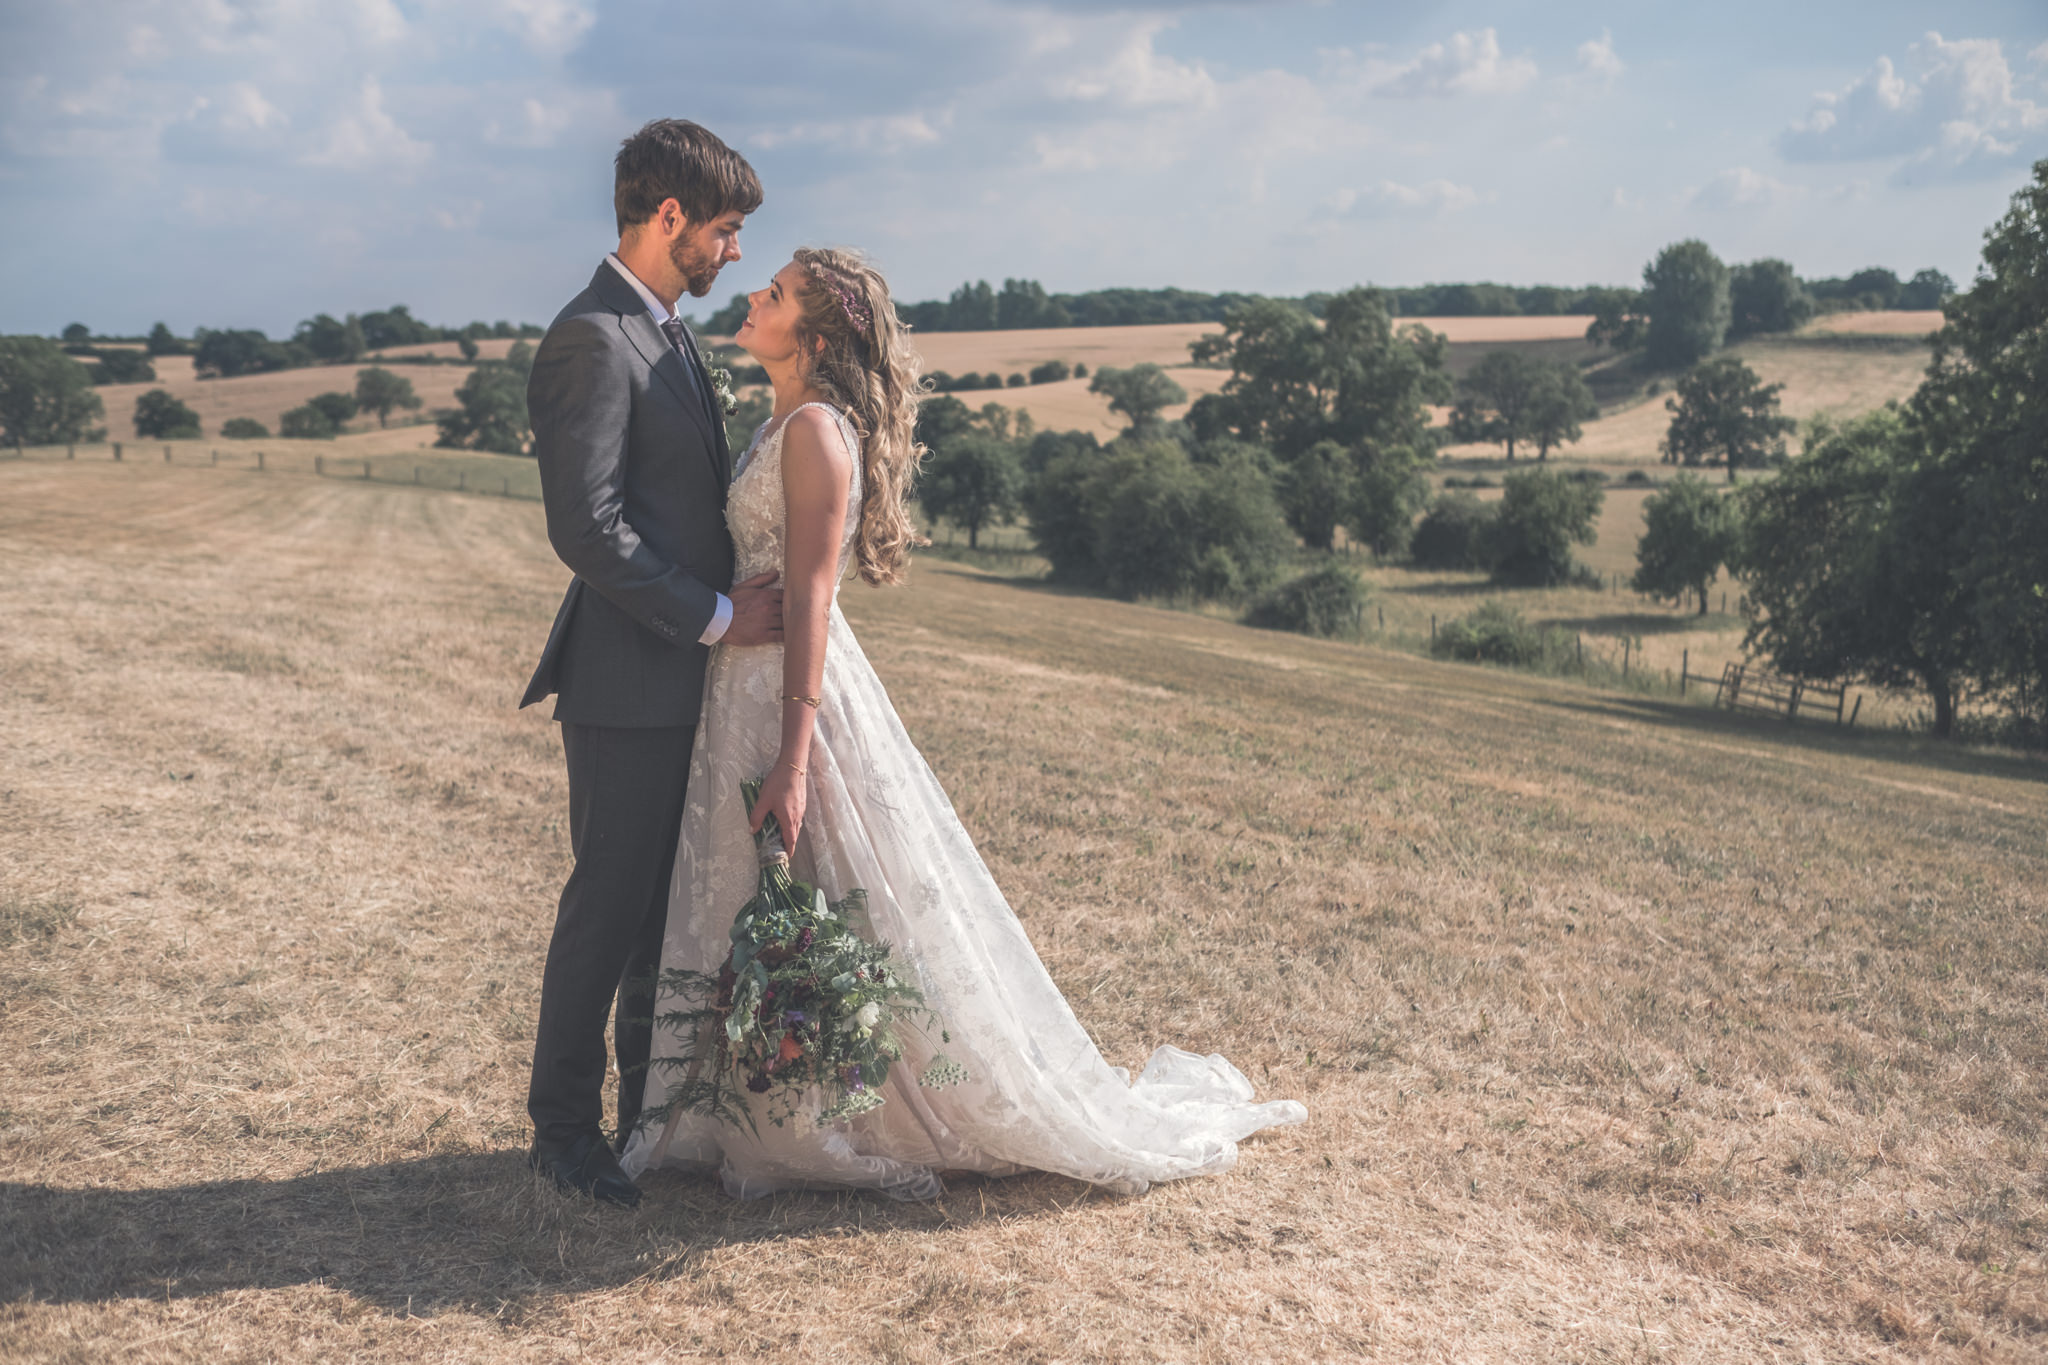 Warwickshire Wedding Photography - Britt & Damain